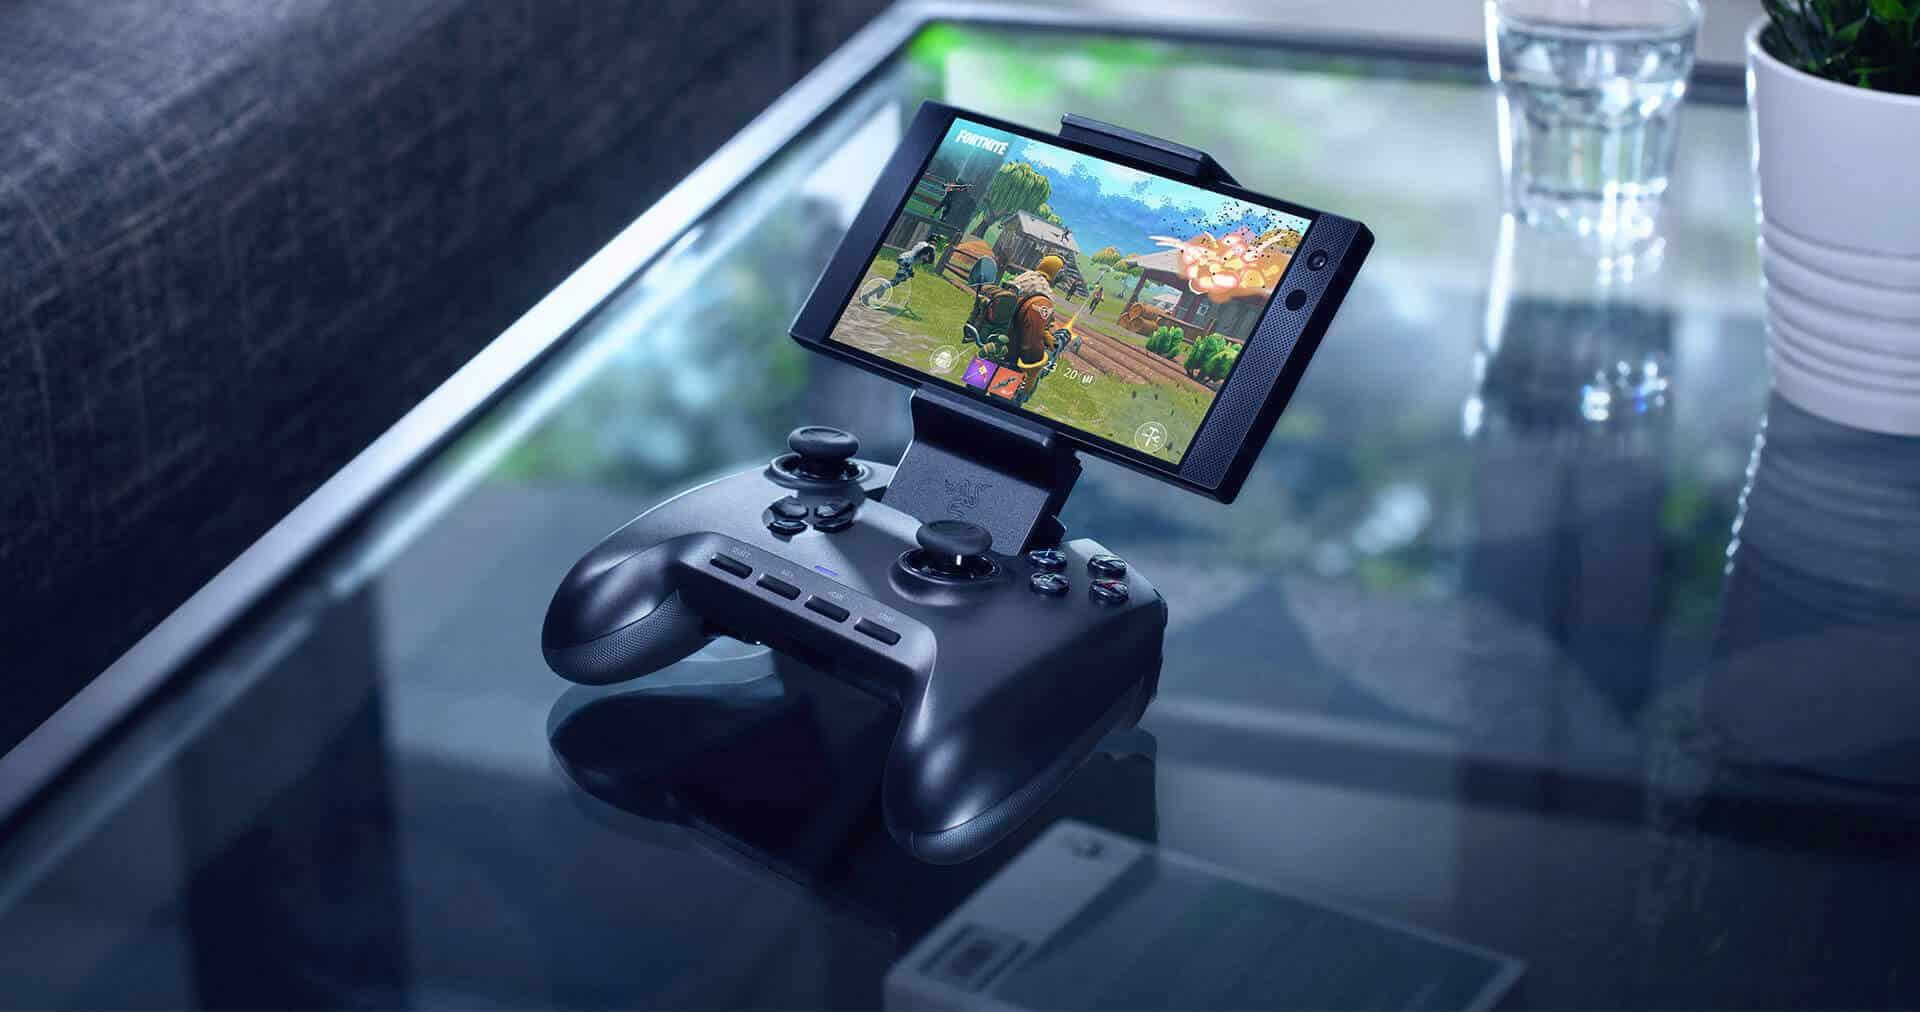 raiju-mobile-hero-desktop-v2-android-controller-game